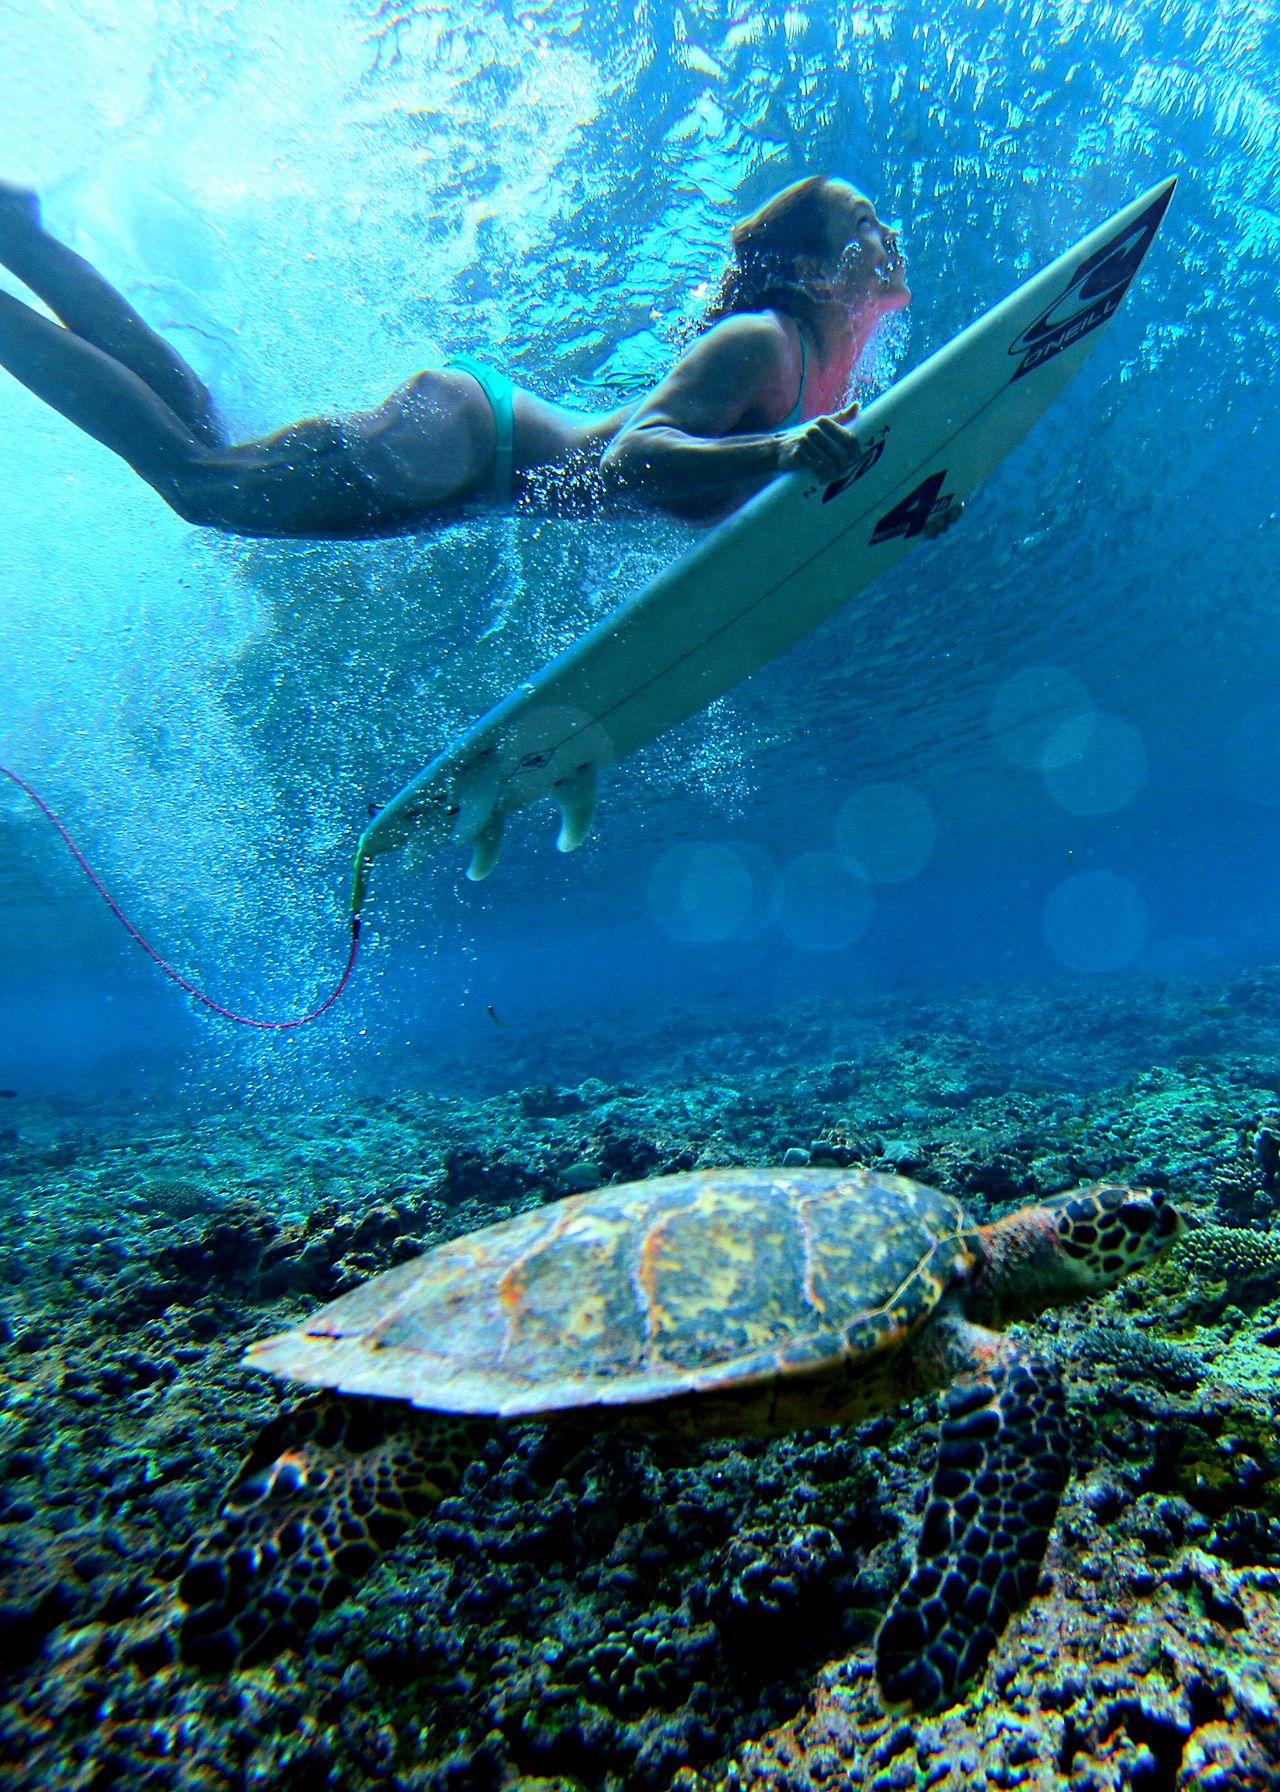 Rip Curl Girl Wallpaper Duck Dive Surf Girl Reef Sea Turtle Surf